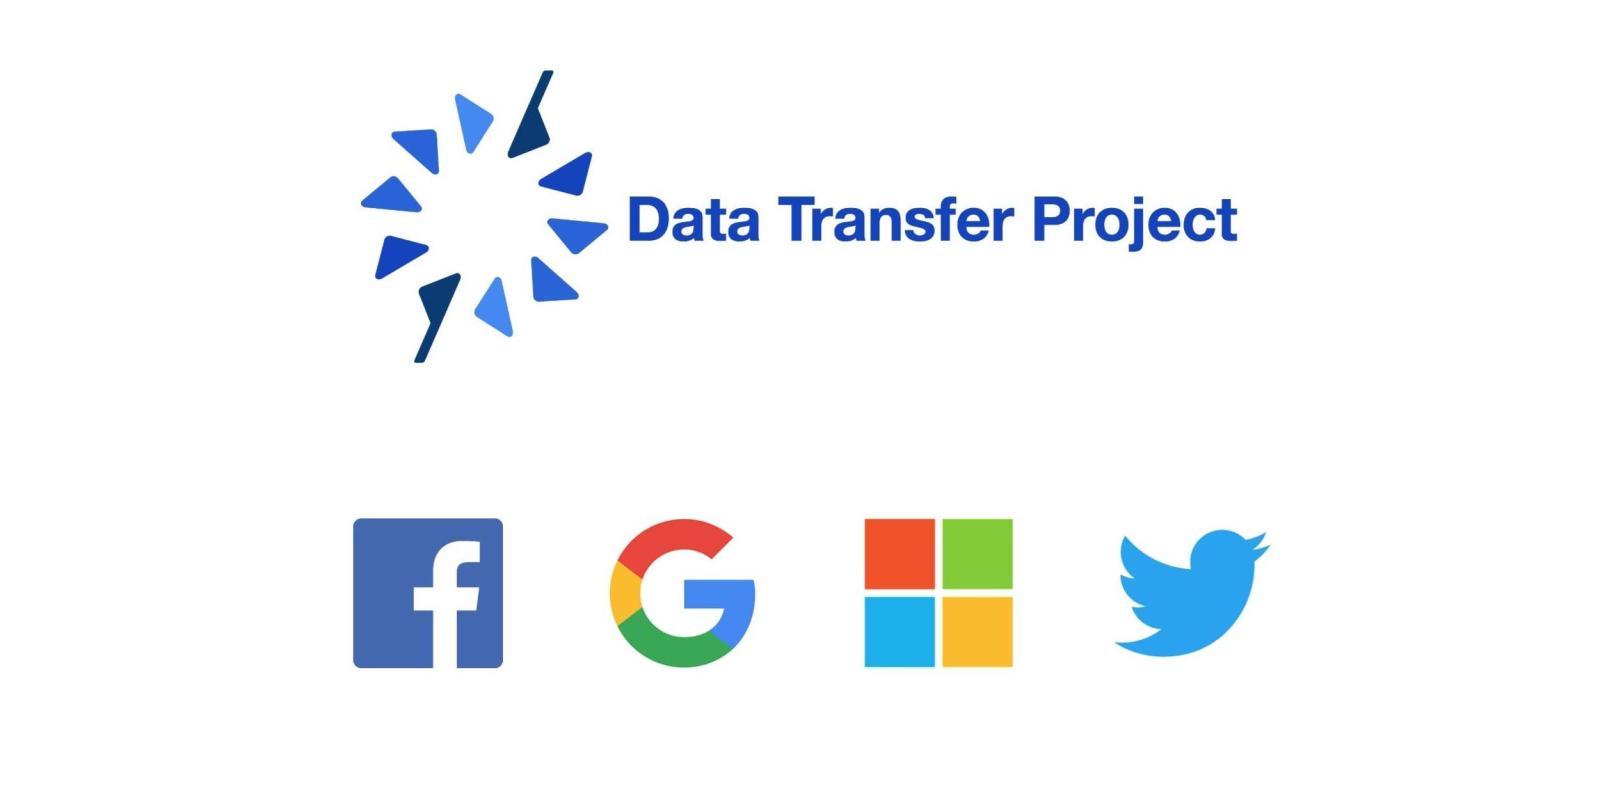 Google, Microsoft, Facebook и Twitter работают вместе над одним проектом